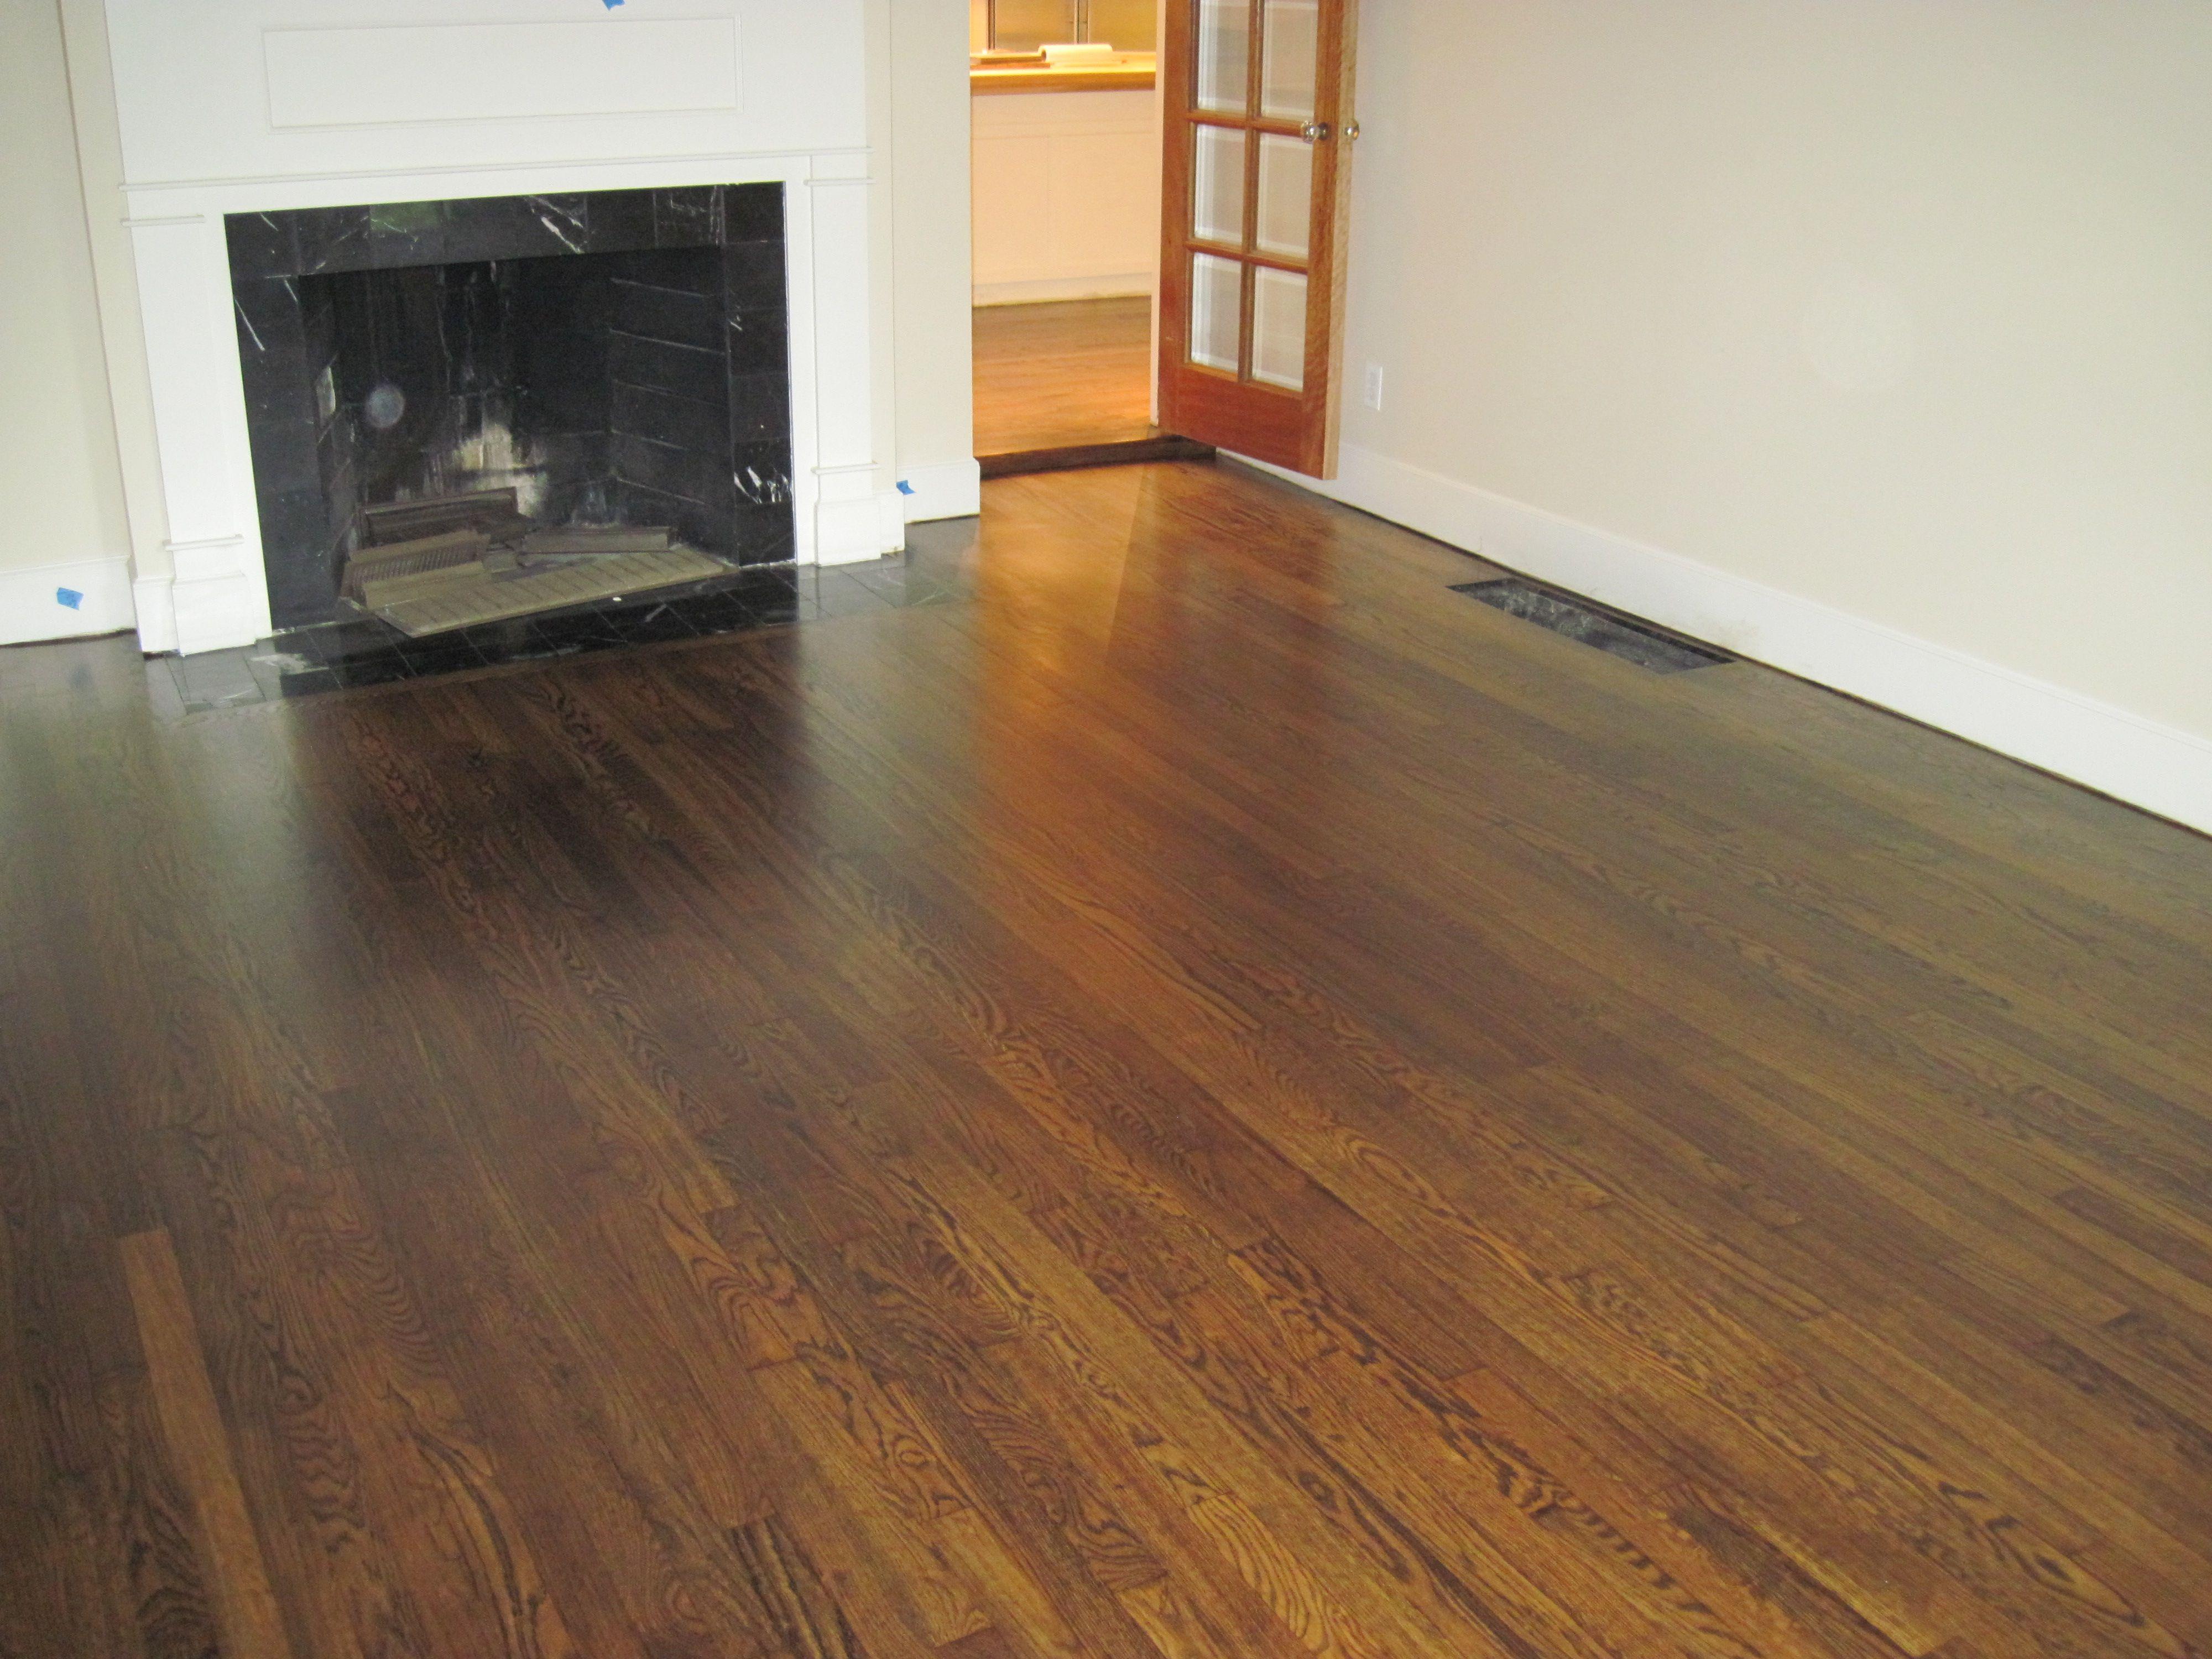 red oak floors stained walnut - Google Search | Floors ...